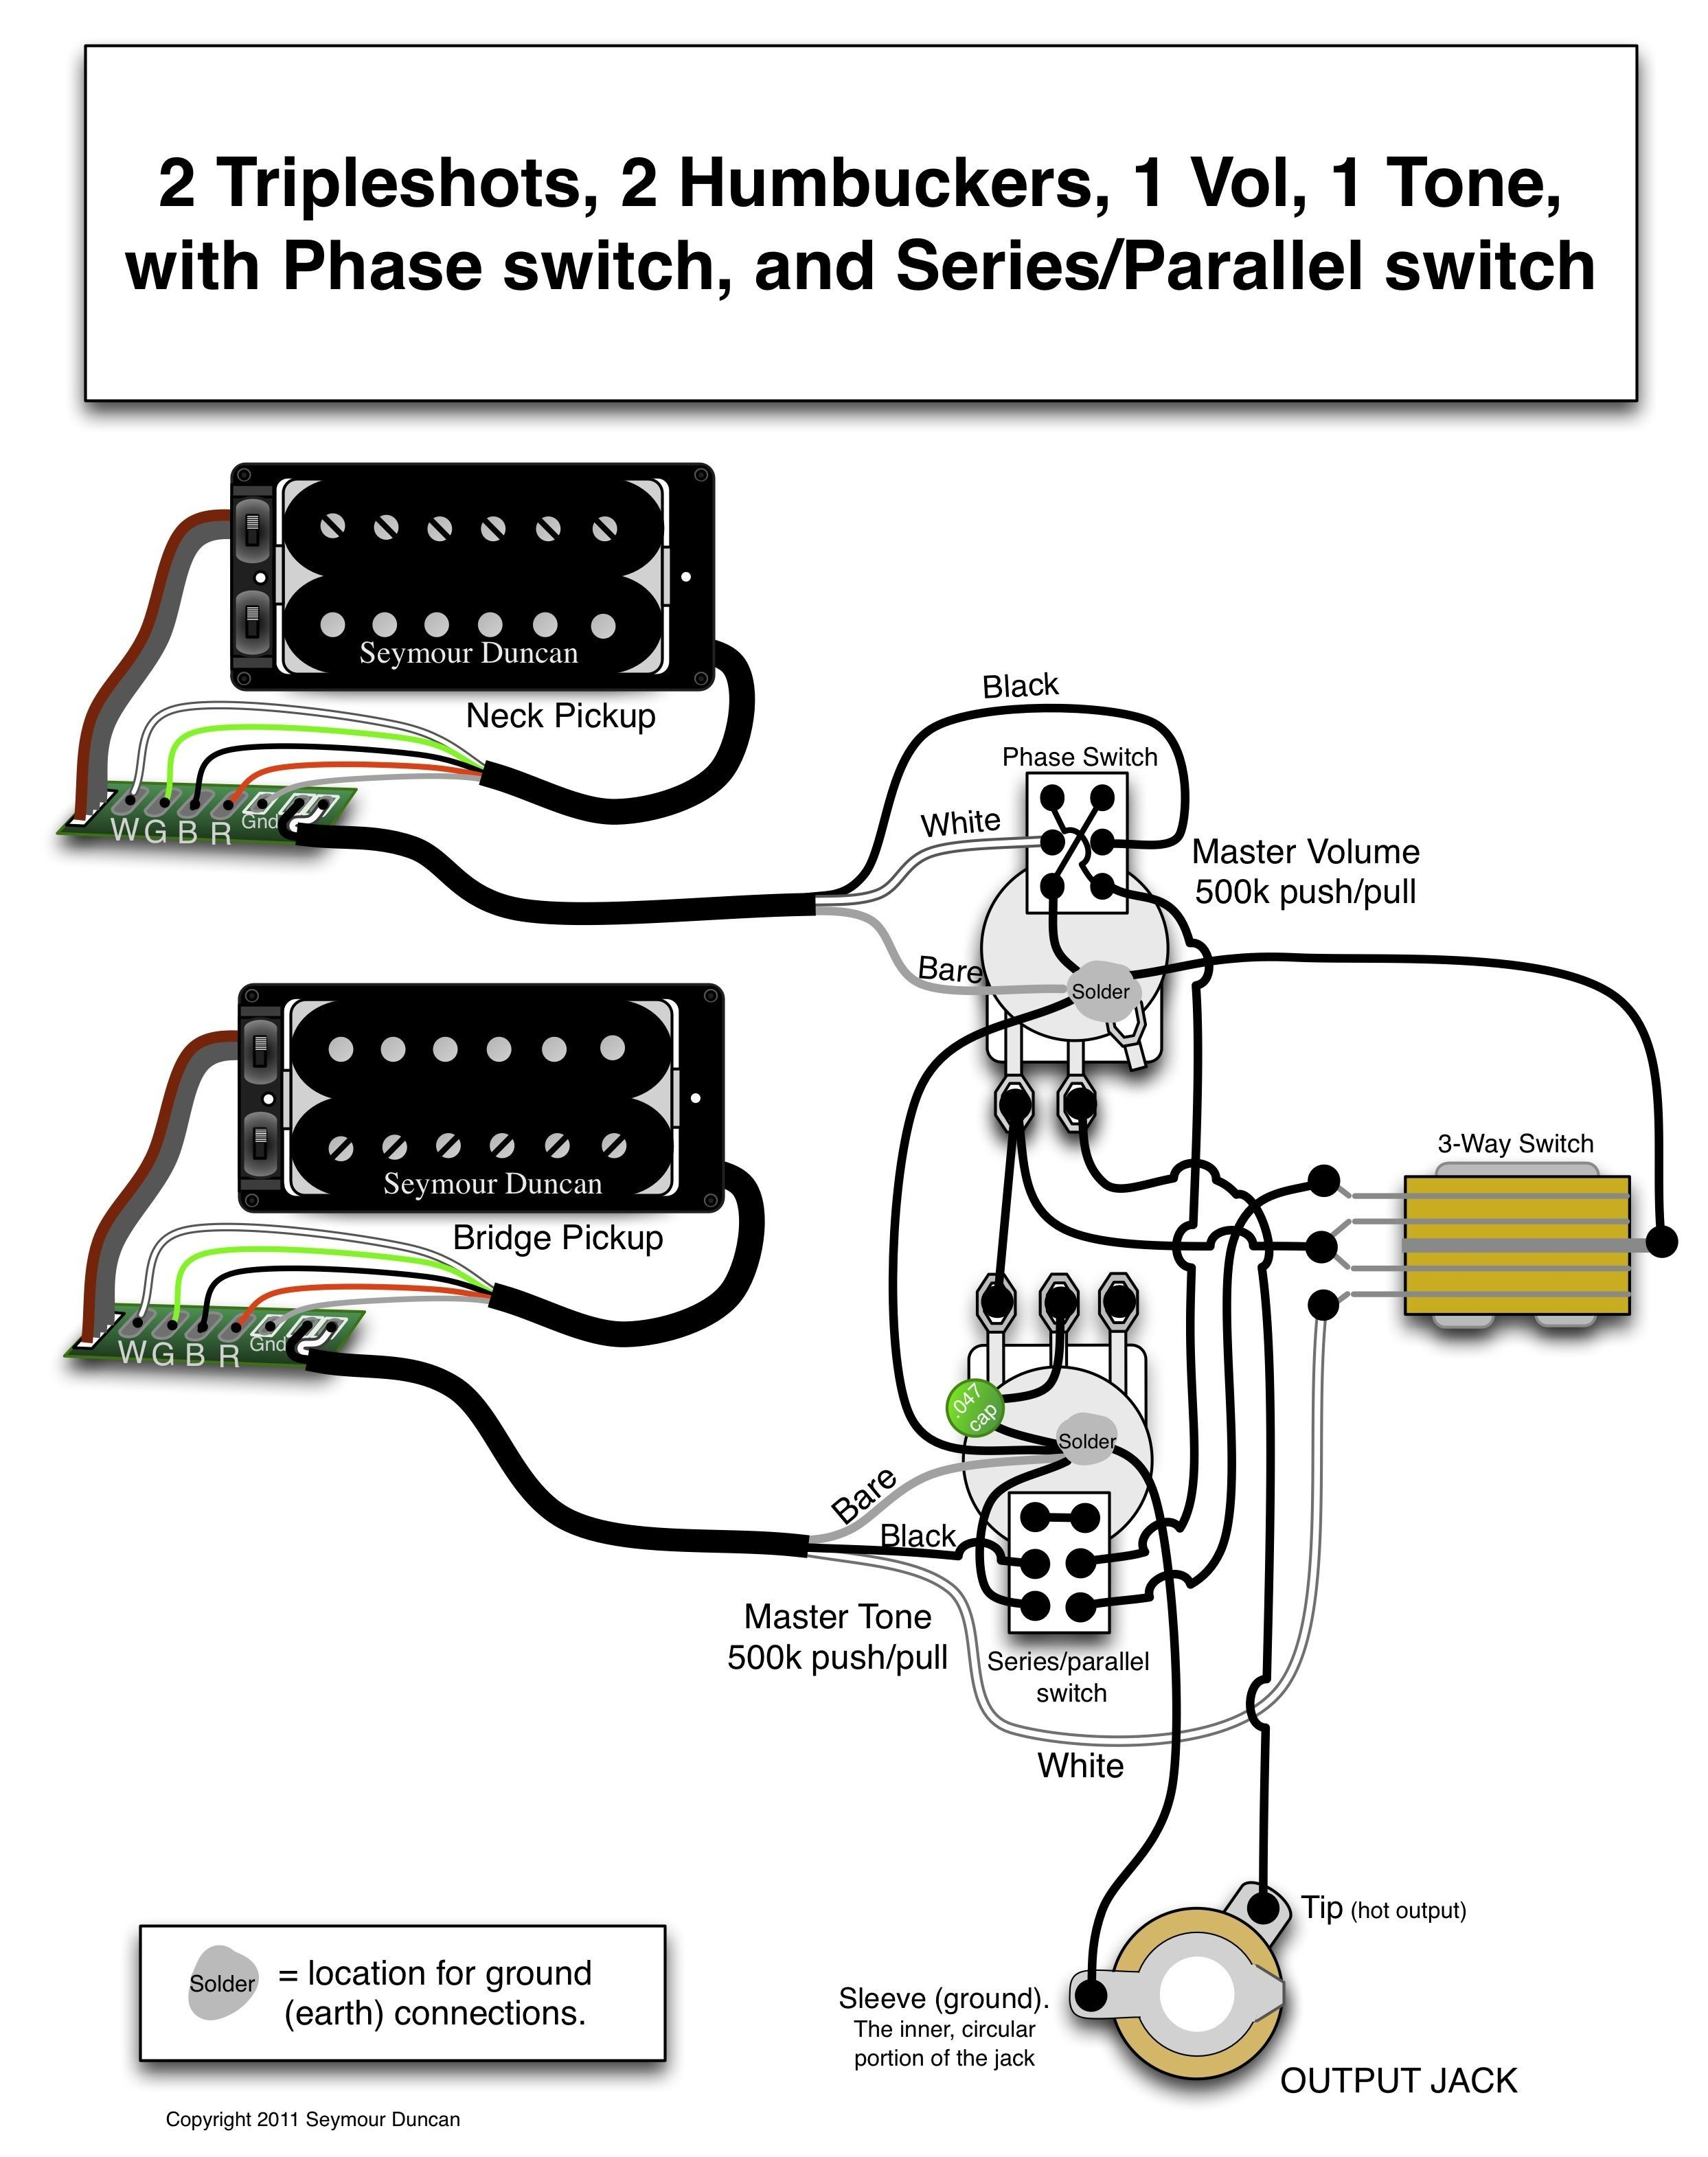 Wiring Diagrams Guitar Humbuckers Refrence Seymour Duncan Wiring Diagram 2 Triple Shots 2 Humbuckers 1 Vol